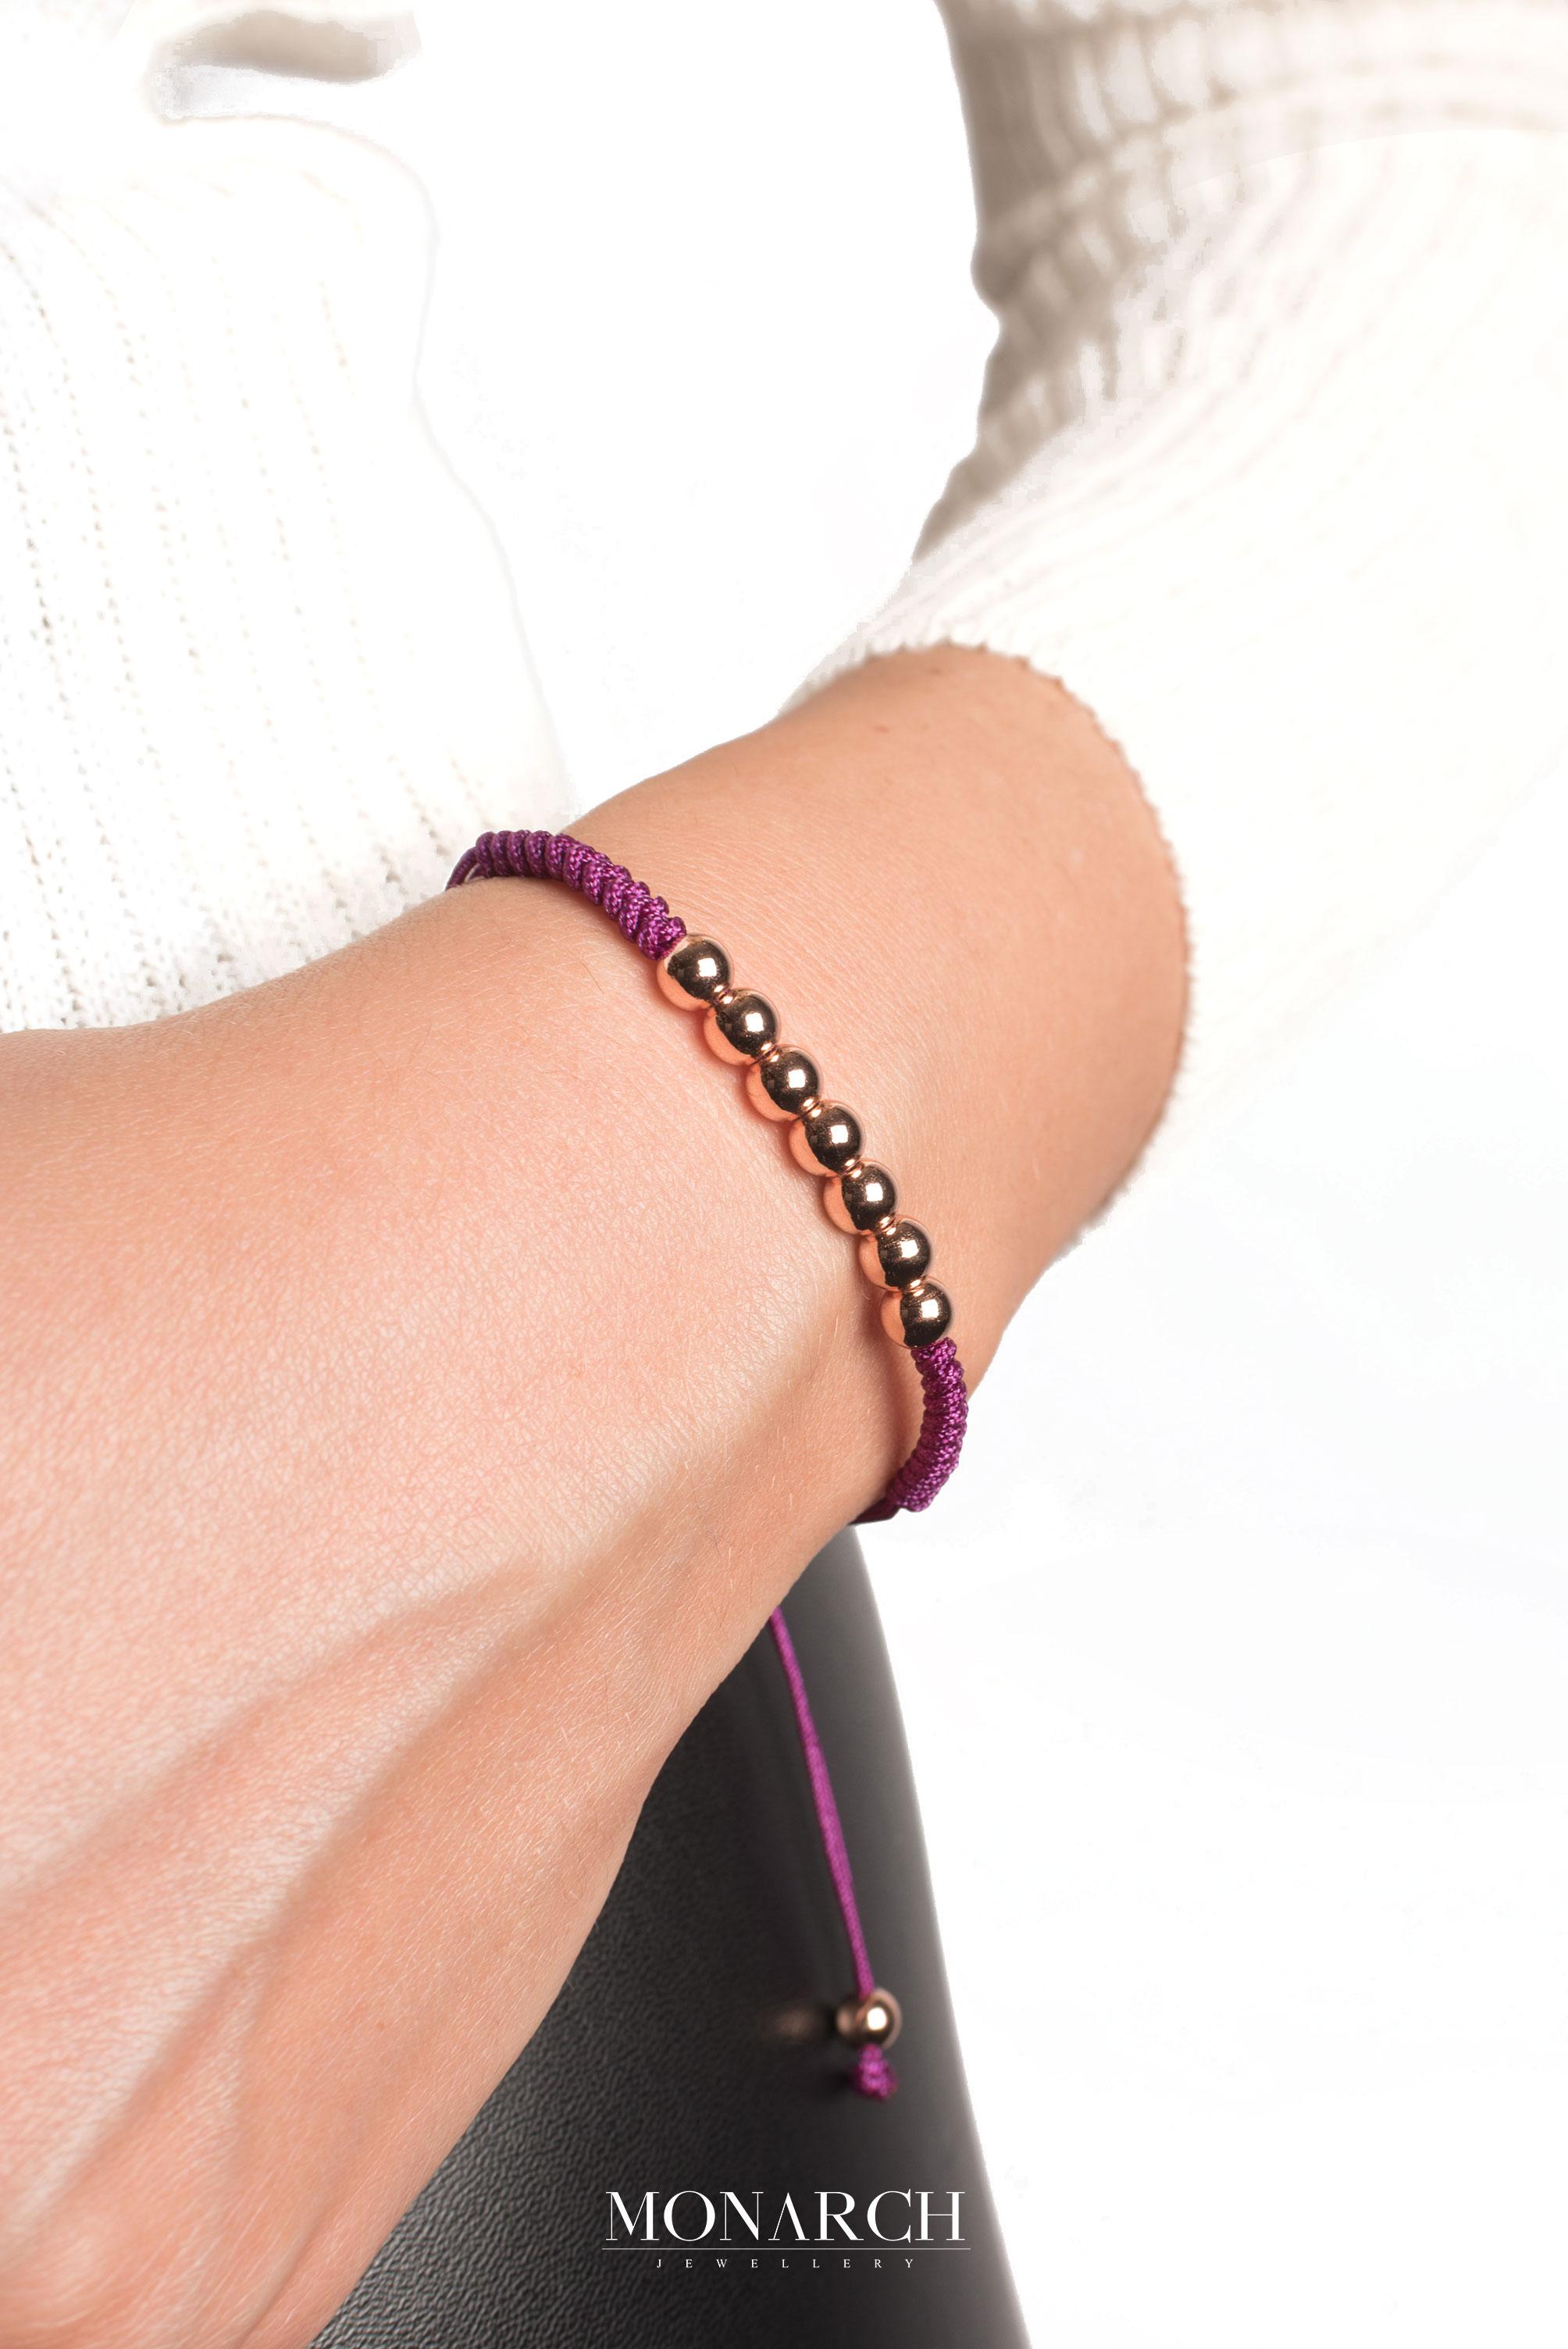 Monarch Jewellery Luxury Bracelet MA46GRMA women